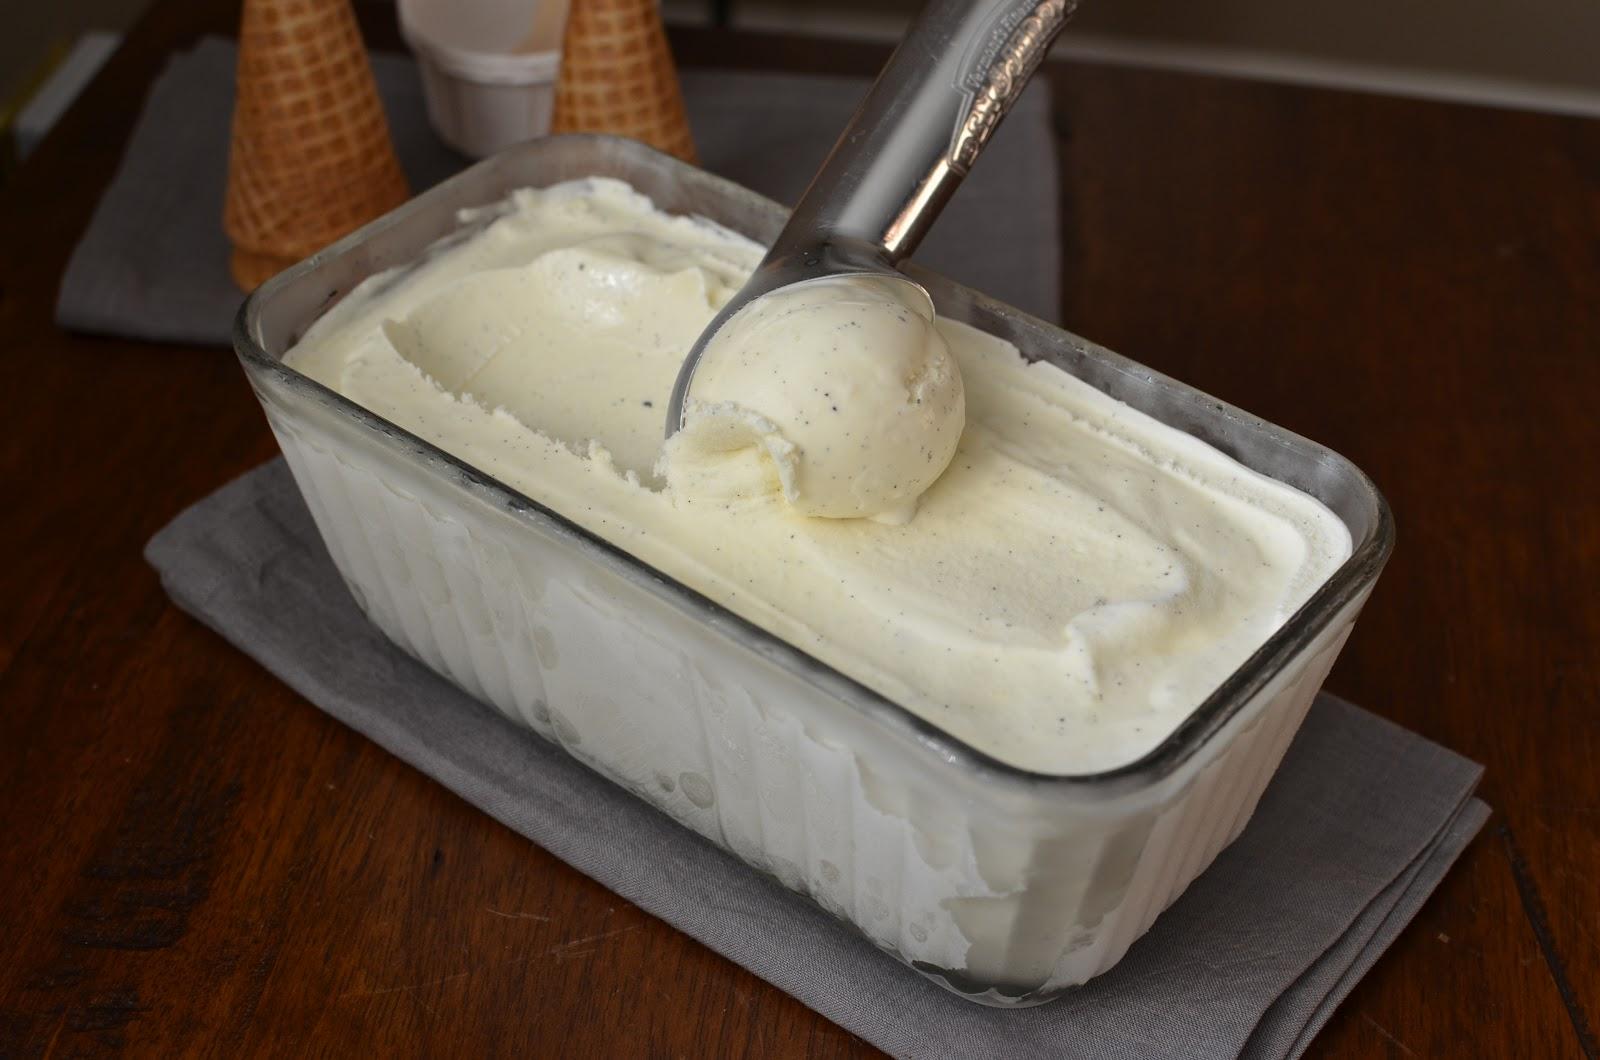 Playing with Flour: Philadelphia-style (no egg) vanilla ice cream